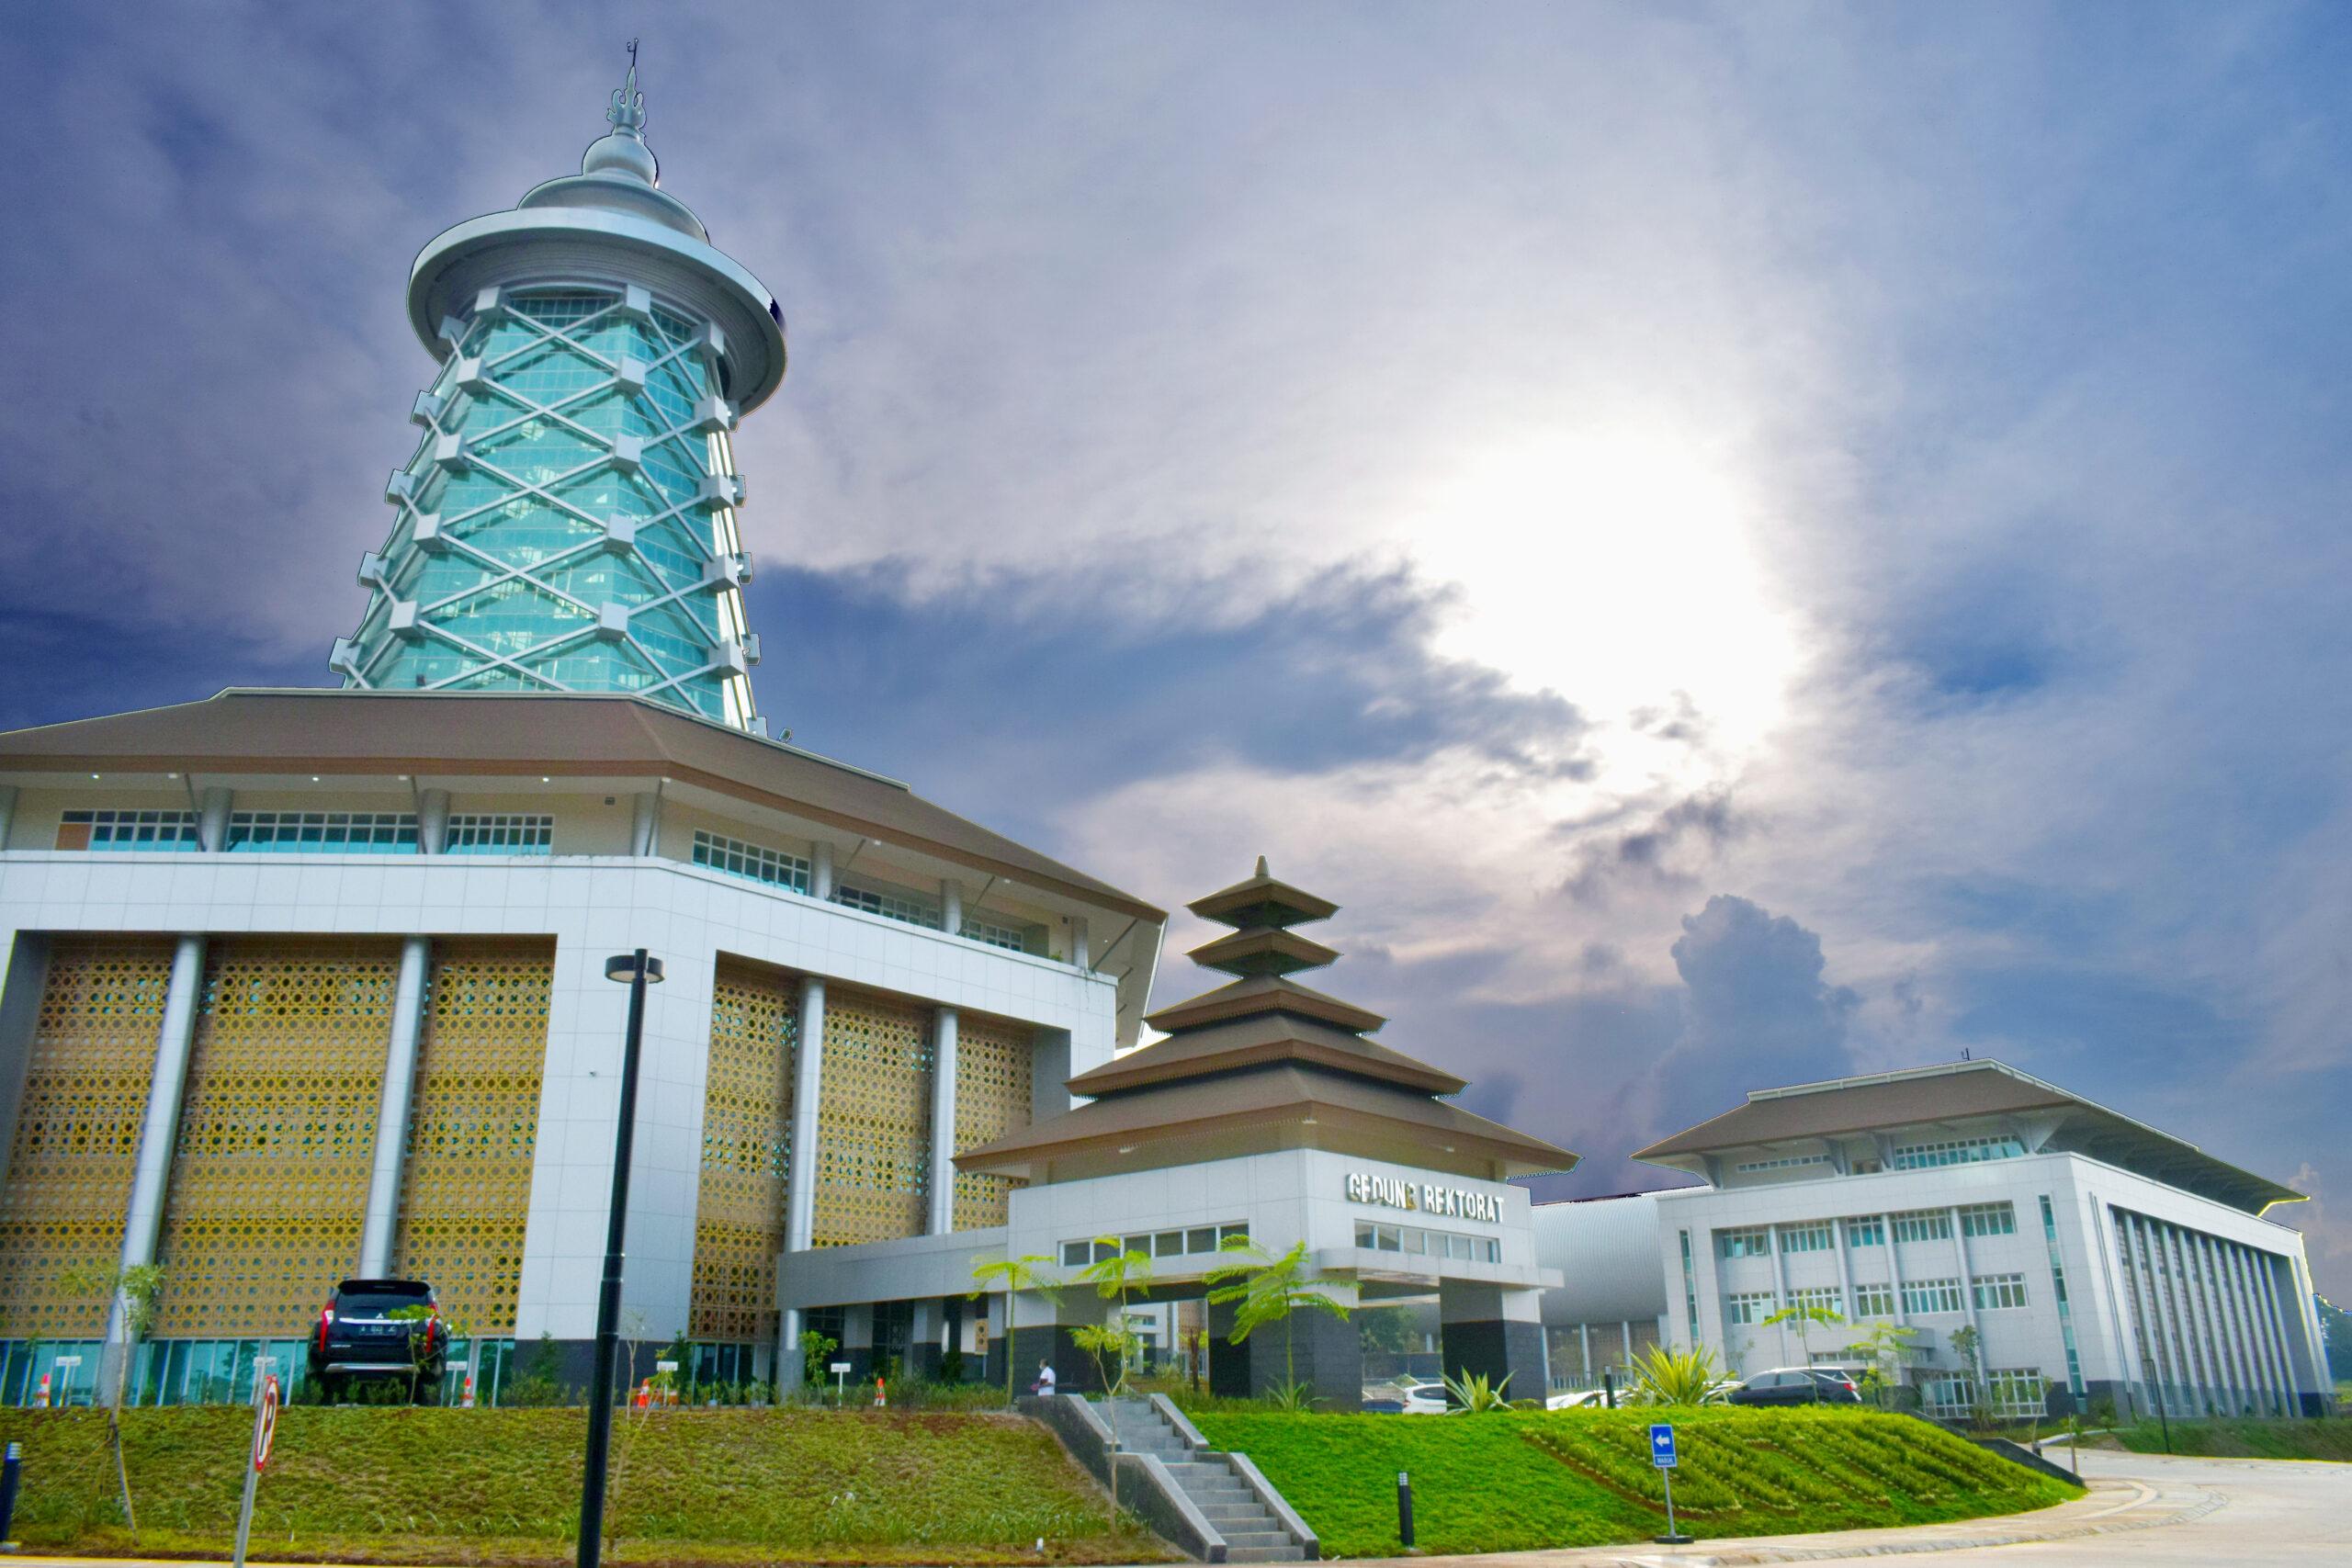 Untirta Jalin Kemitraan dalam Proyek Penelitian Internasional Bersama University of East Anglia dan Lima Perguruan Tinggi di Vietnam dan Cina